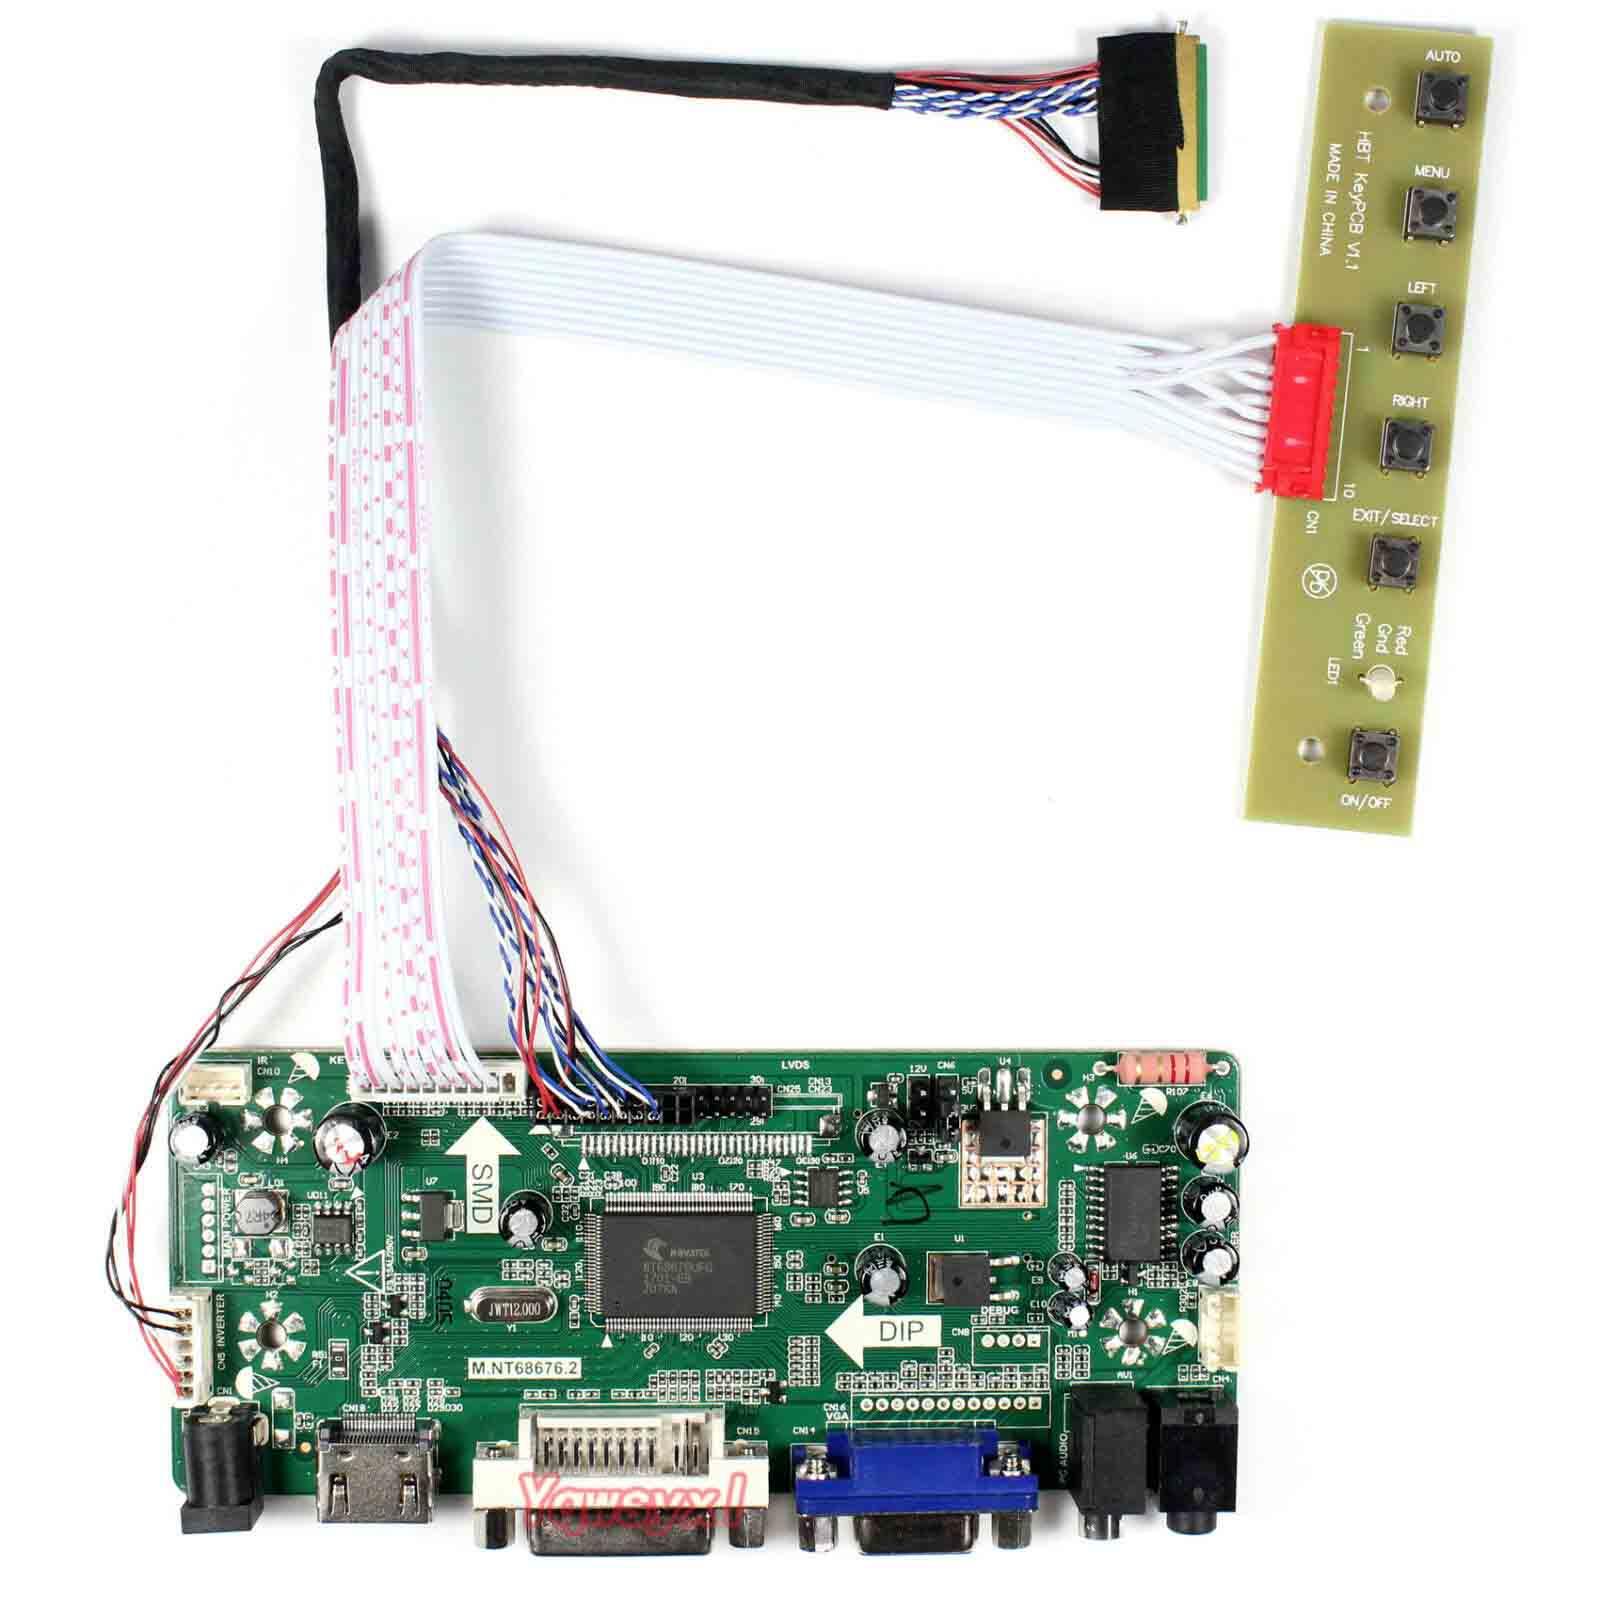 Yqwsyxl Control Board Monitor Kit For LP133WH1-TLB1 LP133WH1-TLA1  HDMI+DVI+VGA LCD LED Screen Controller Board Driver